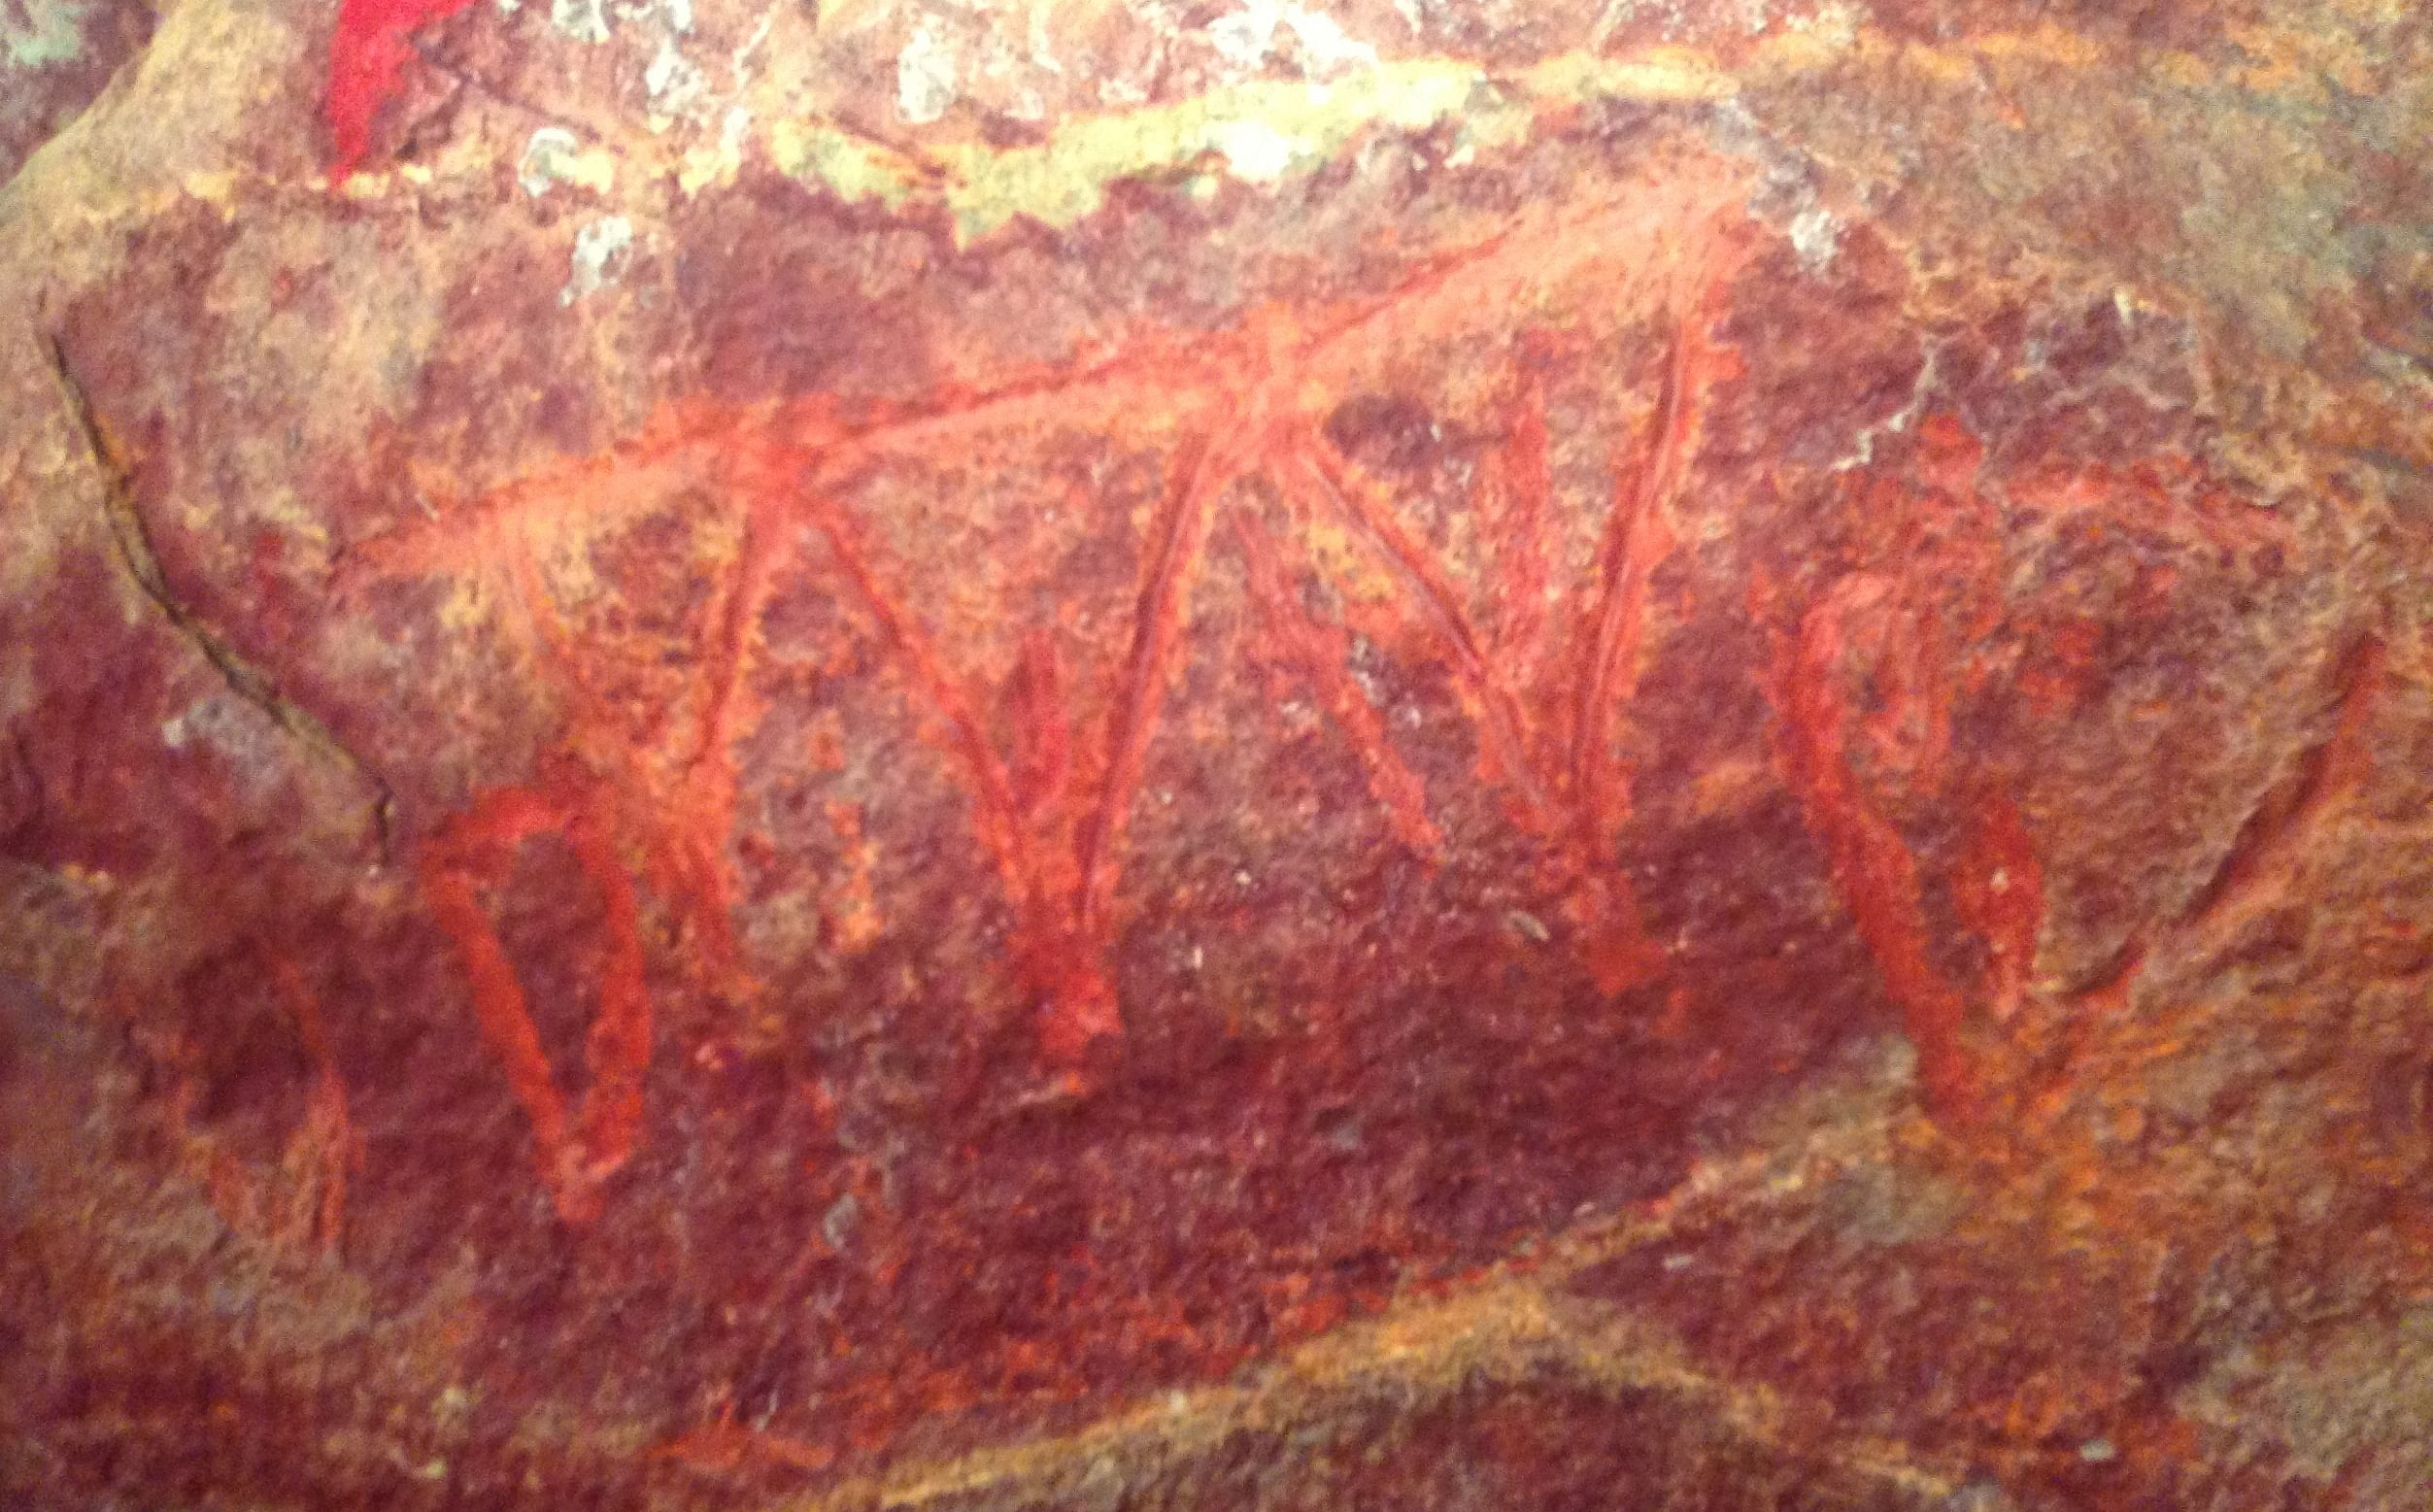 Petroglyph depicting female genitals from Odisha